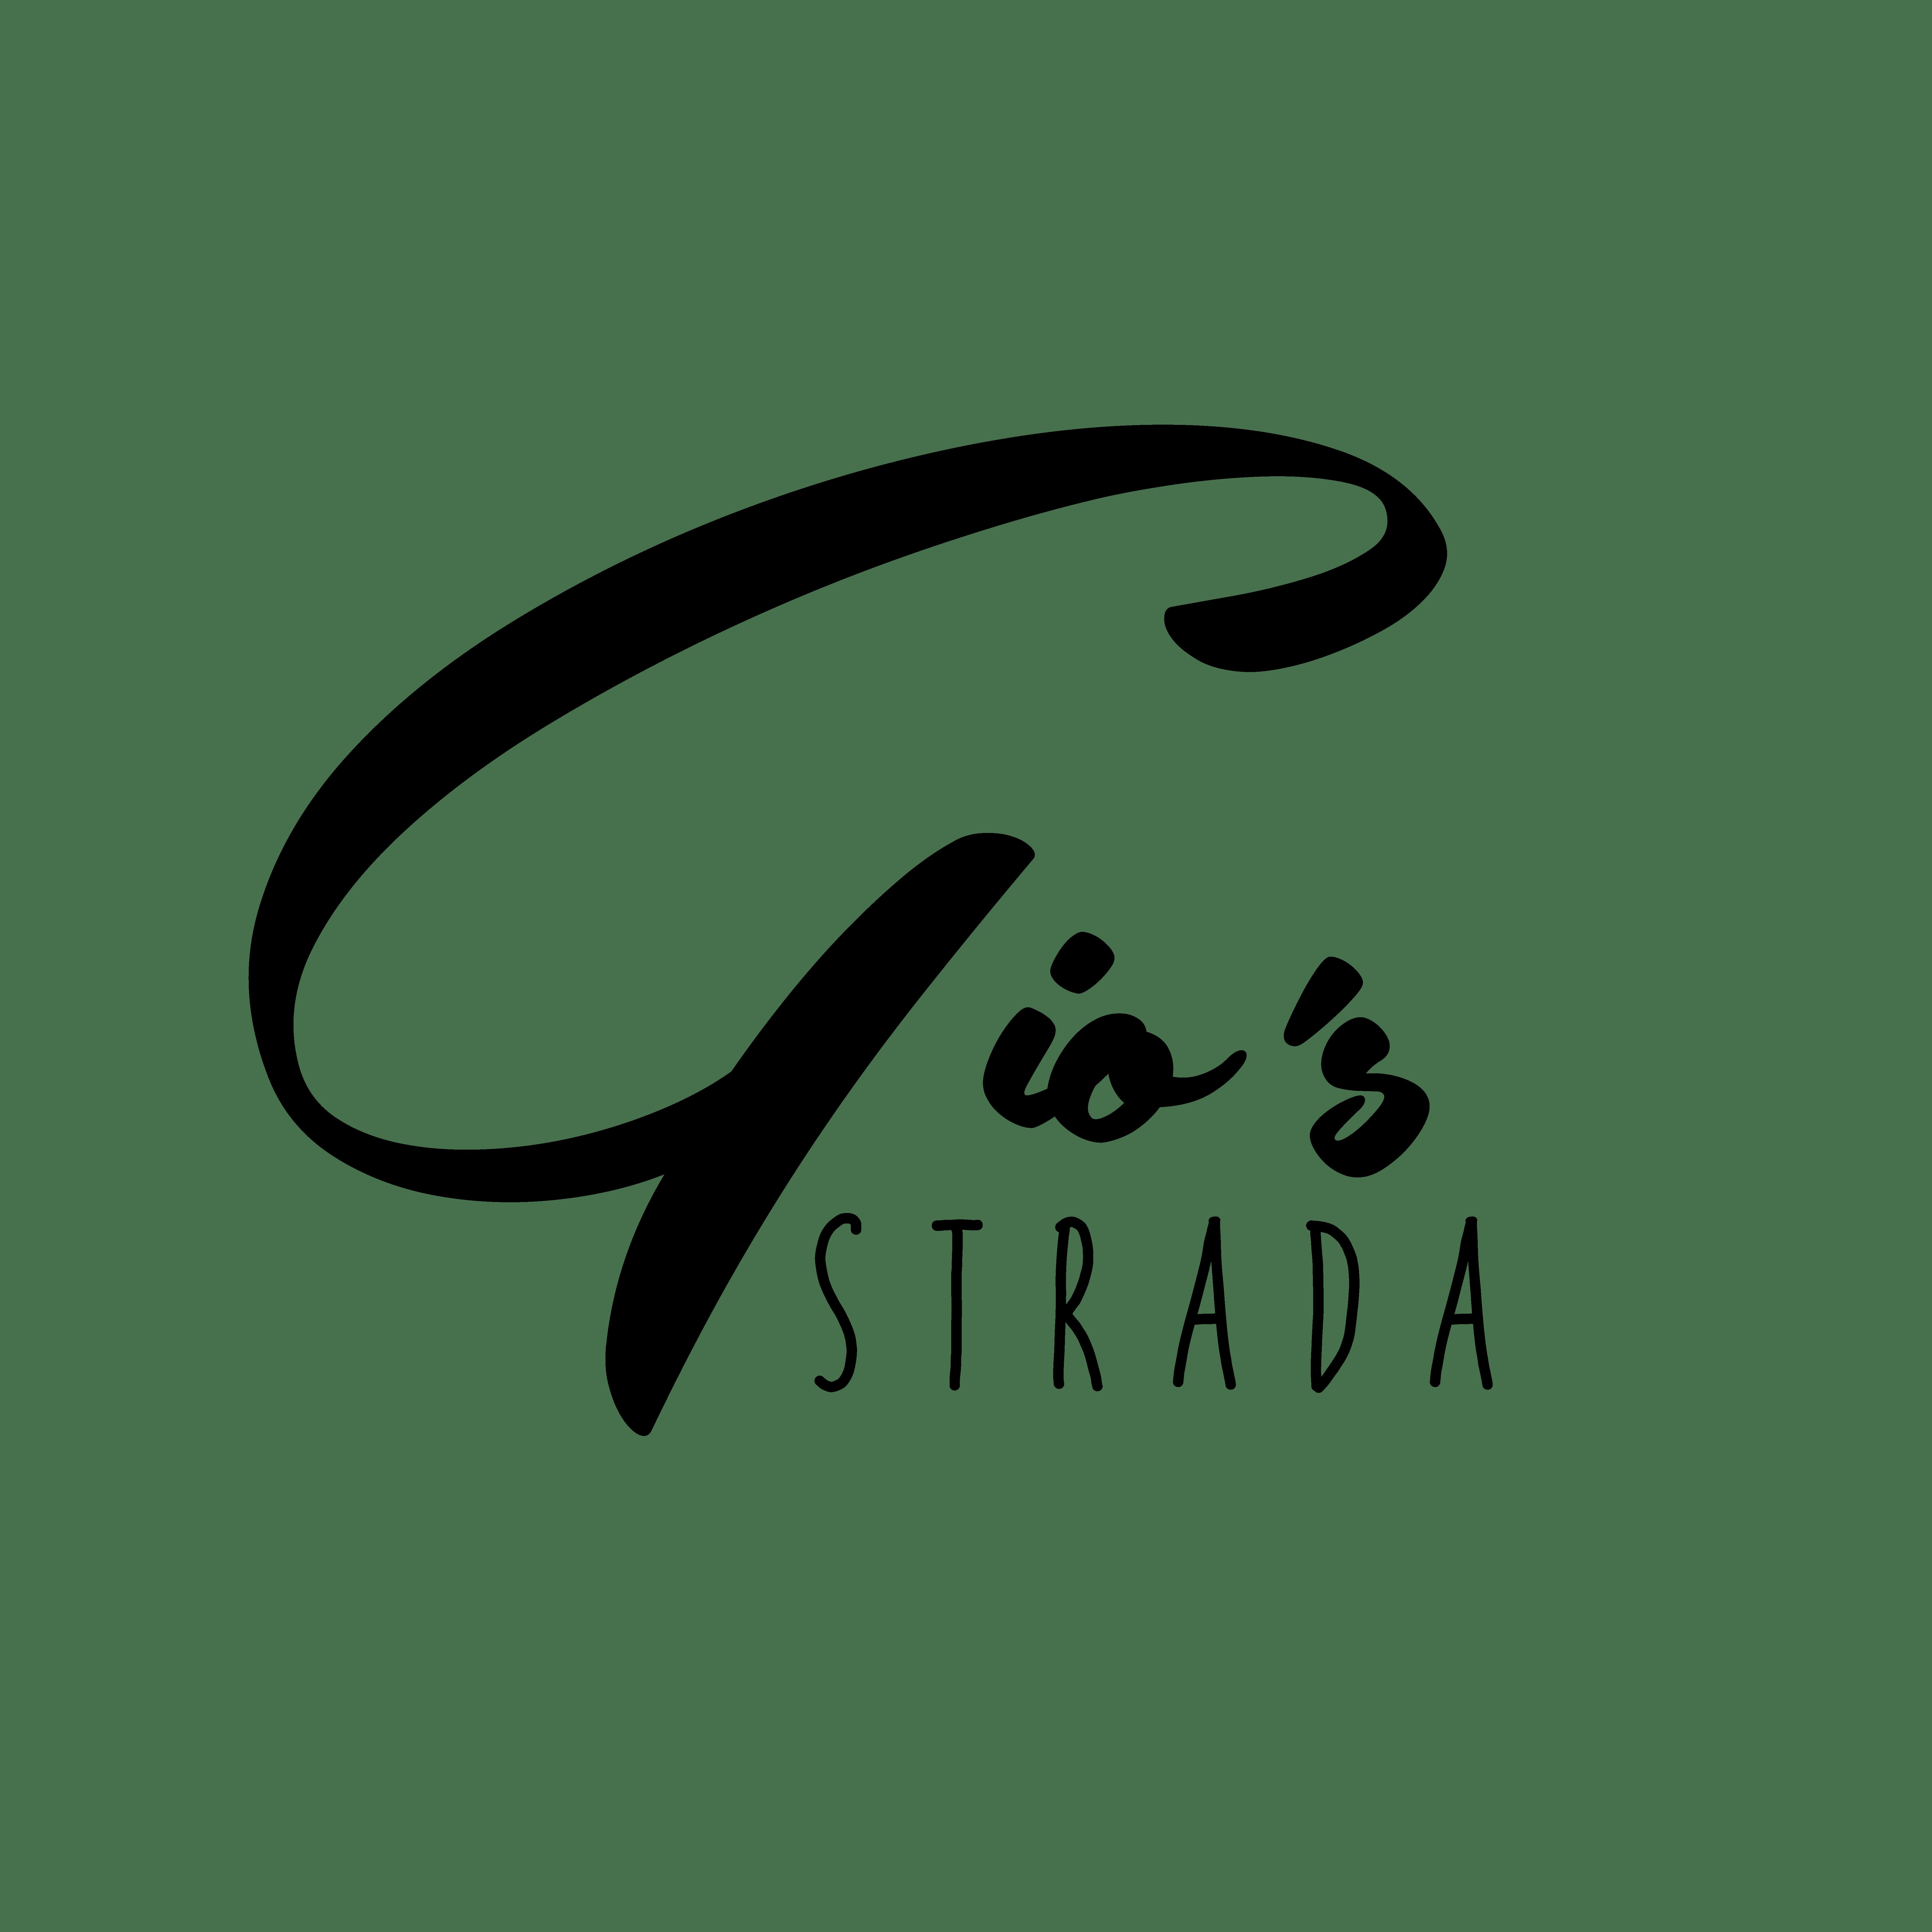 Gio Strada